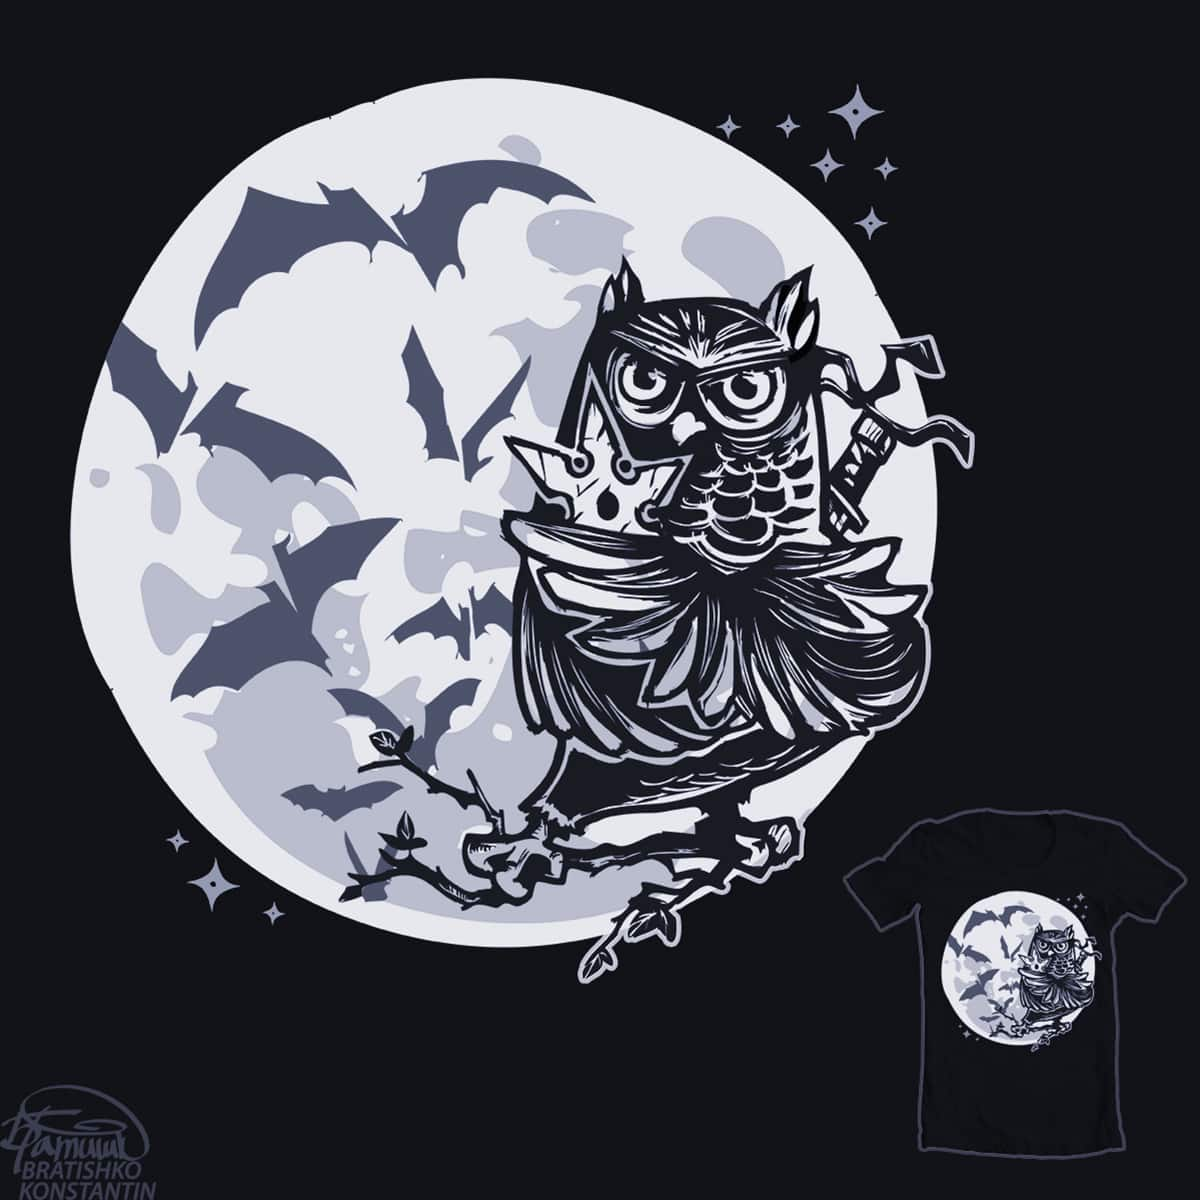 ninja owl  by KONSTANTIN BRATISHKO on Threadless